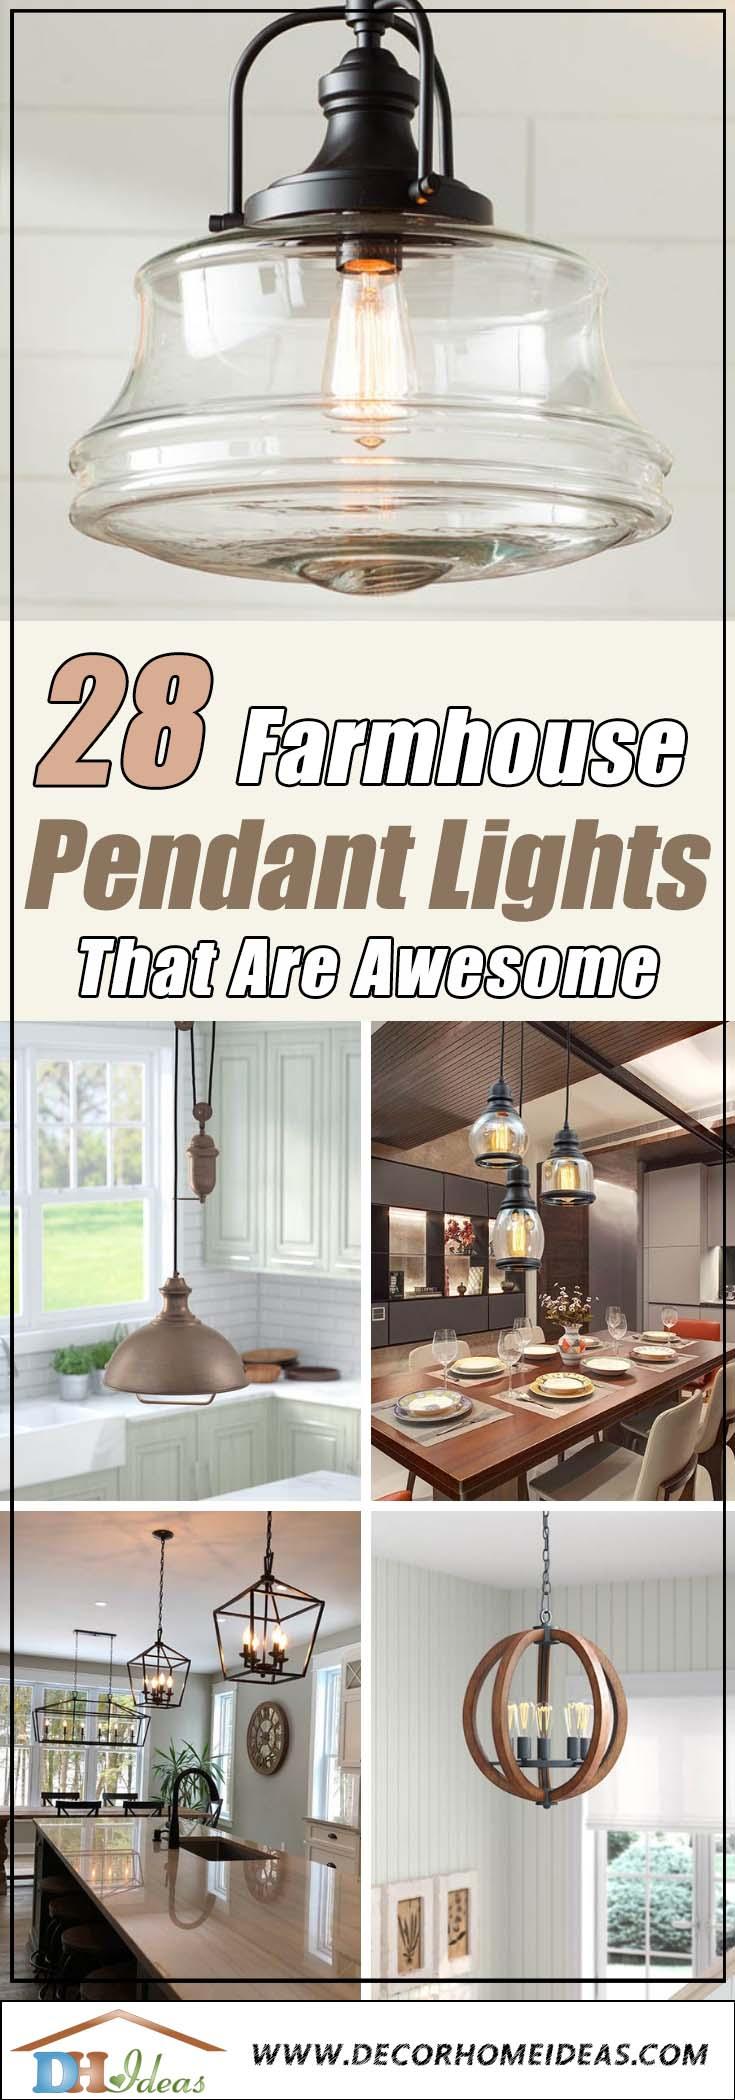 28 Best Farmhouse Pendant Lights You'll Love Throughout Pruett Cognac Glass 8 Light Cluster Pendants (View 21 of 30)